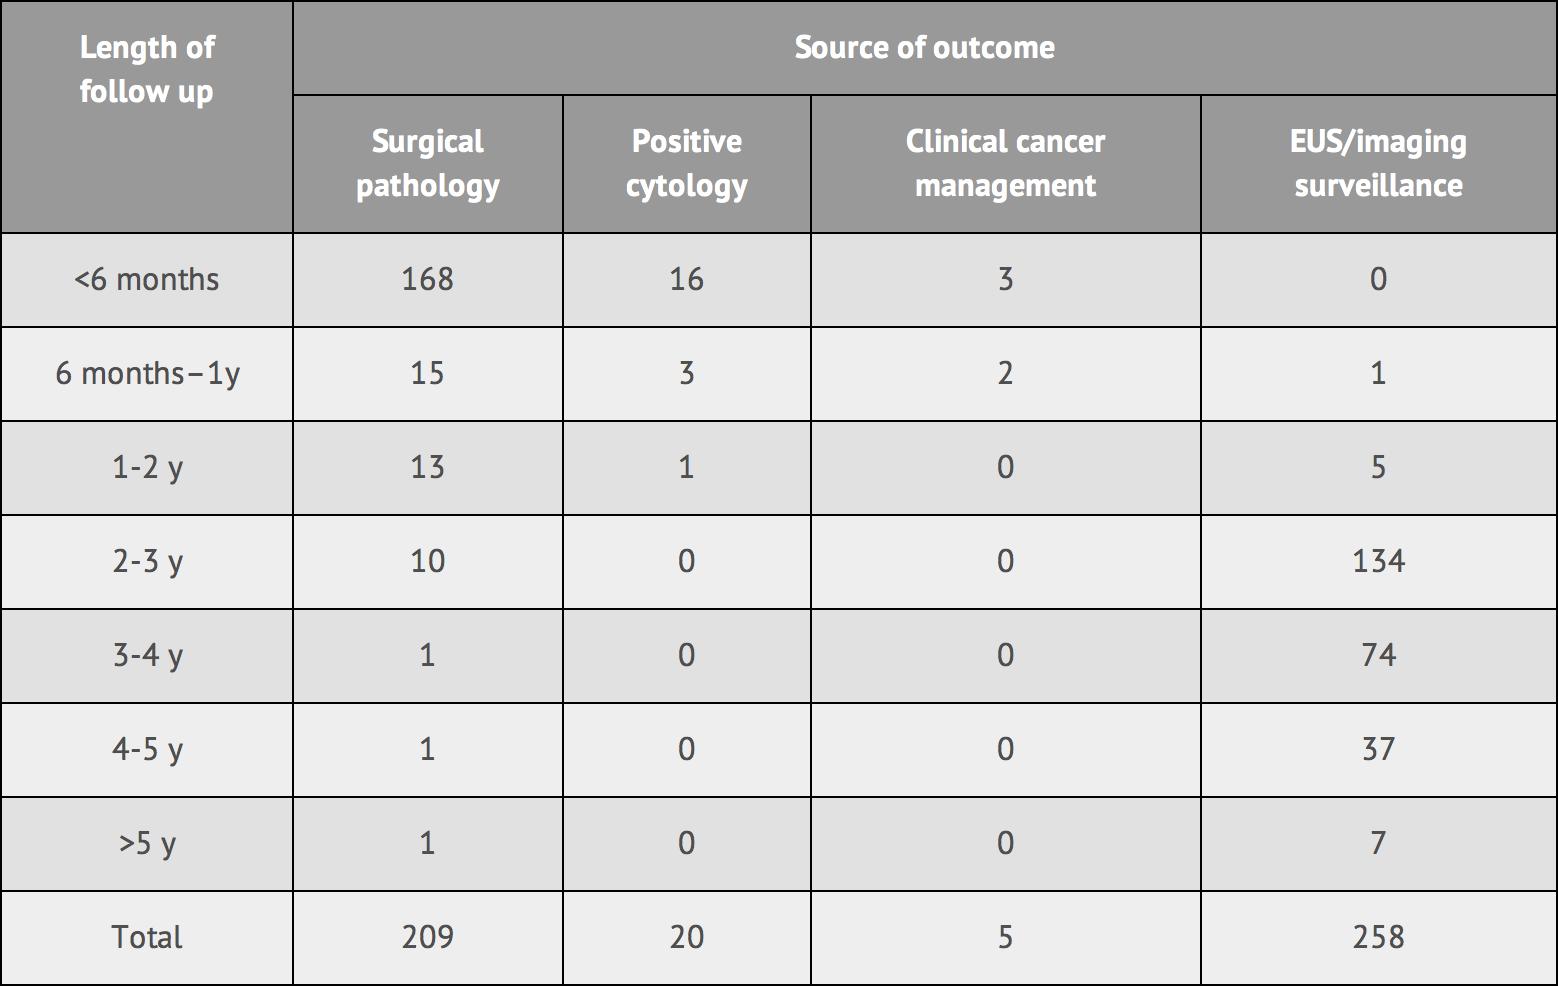 outcome-source-table